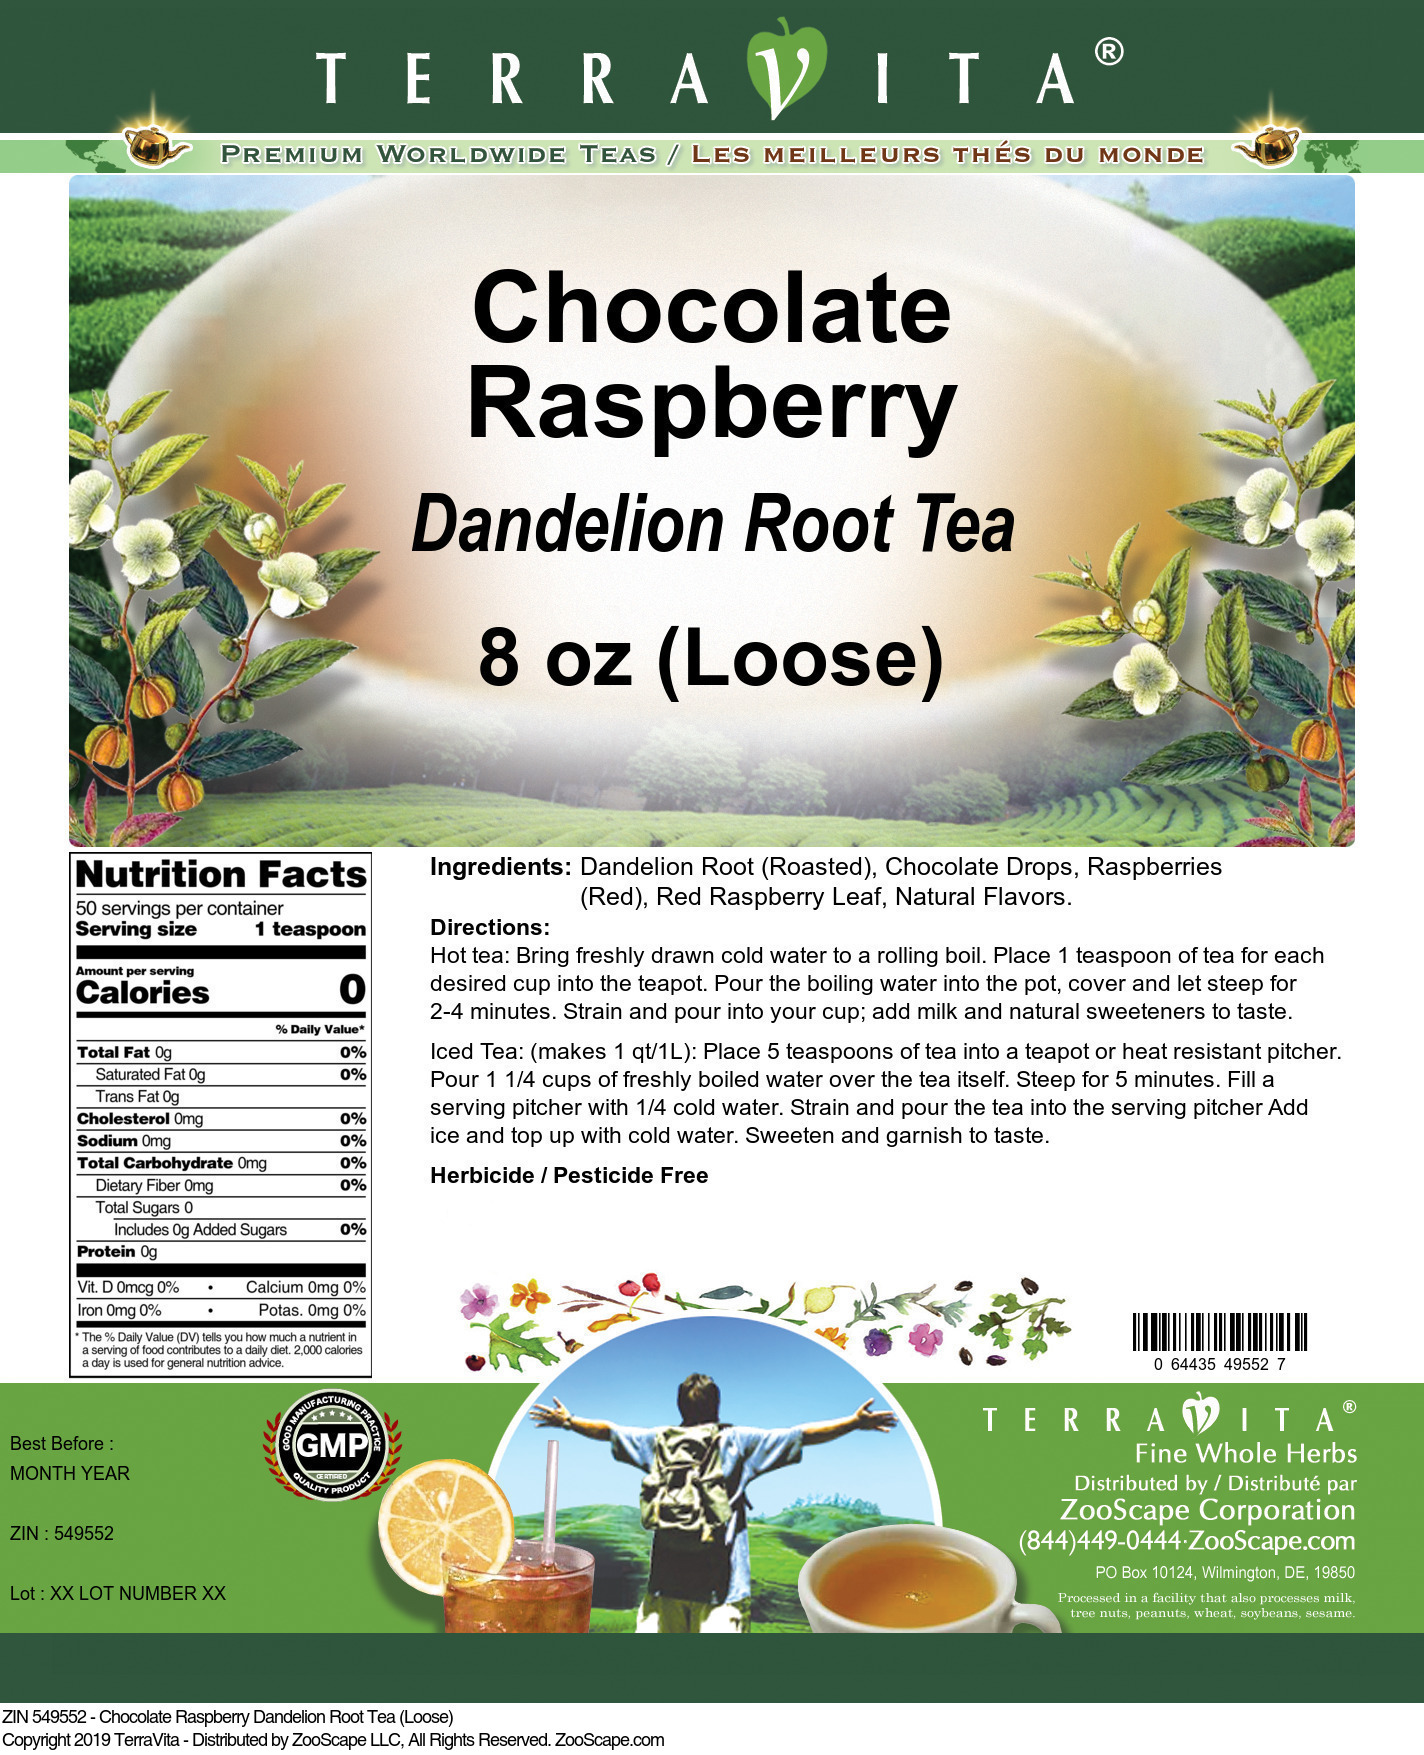 Chocolate Raspberry Dandelion Root